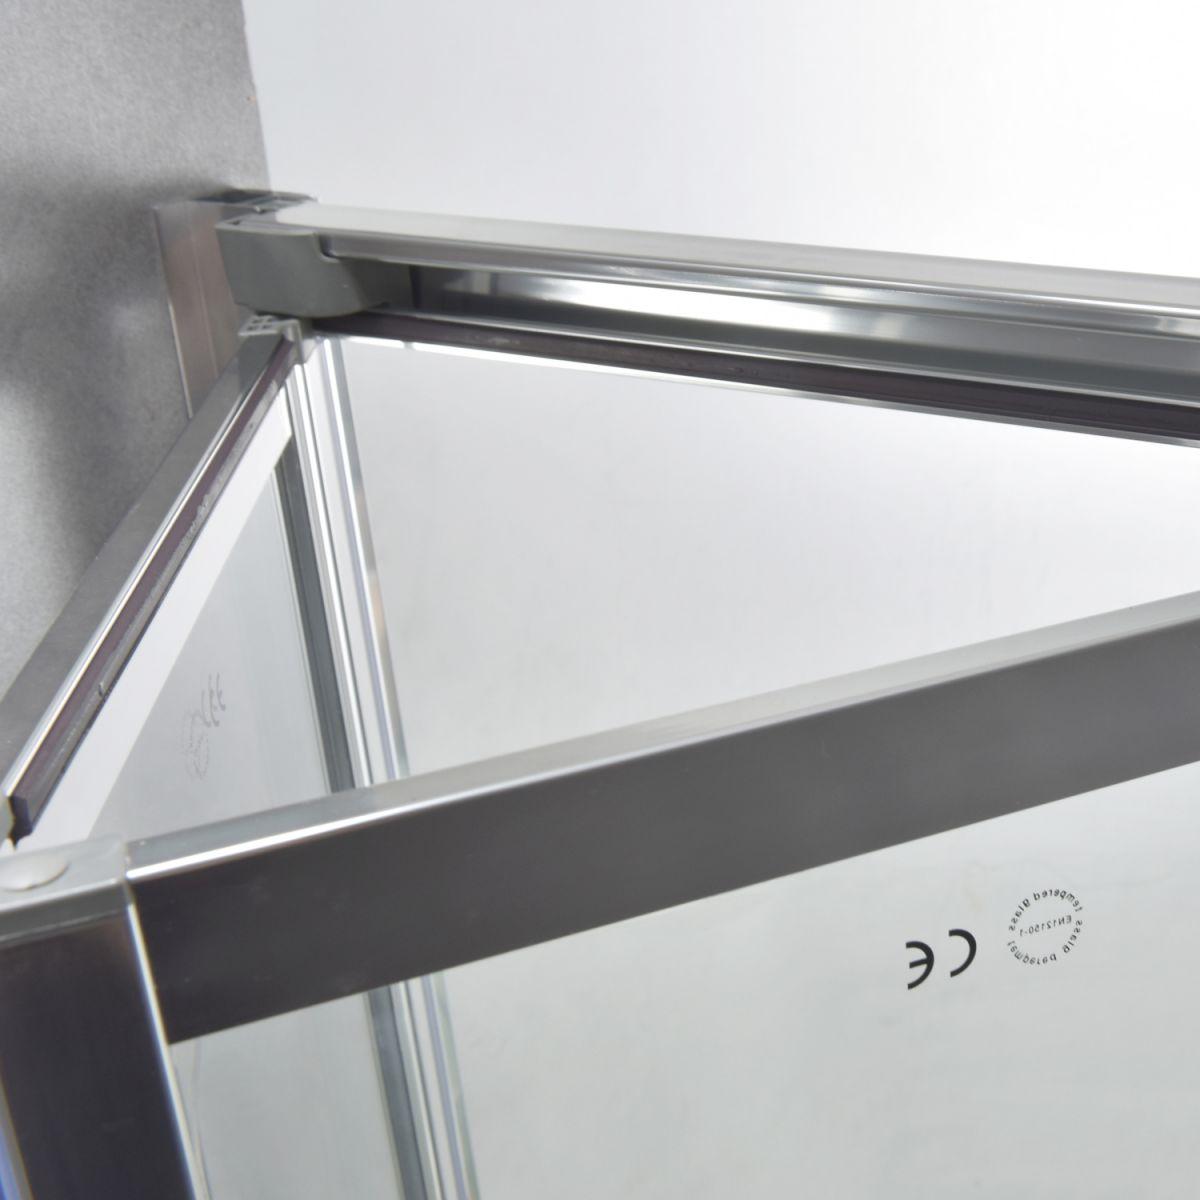 SC 2121 4 Porta doccia